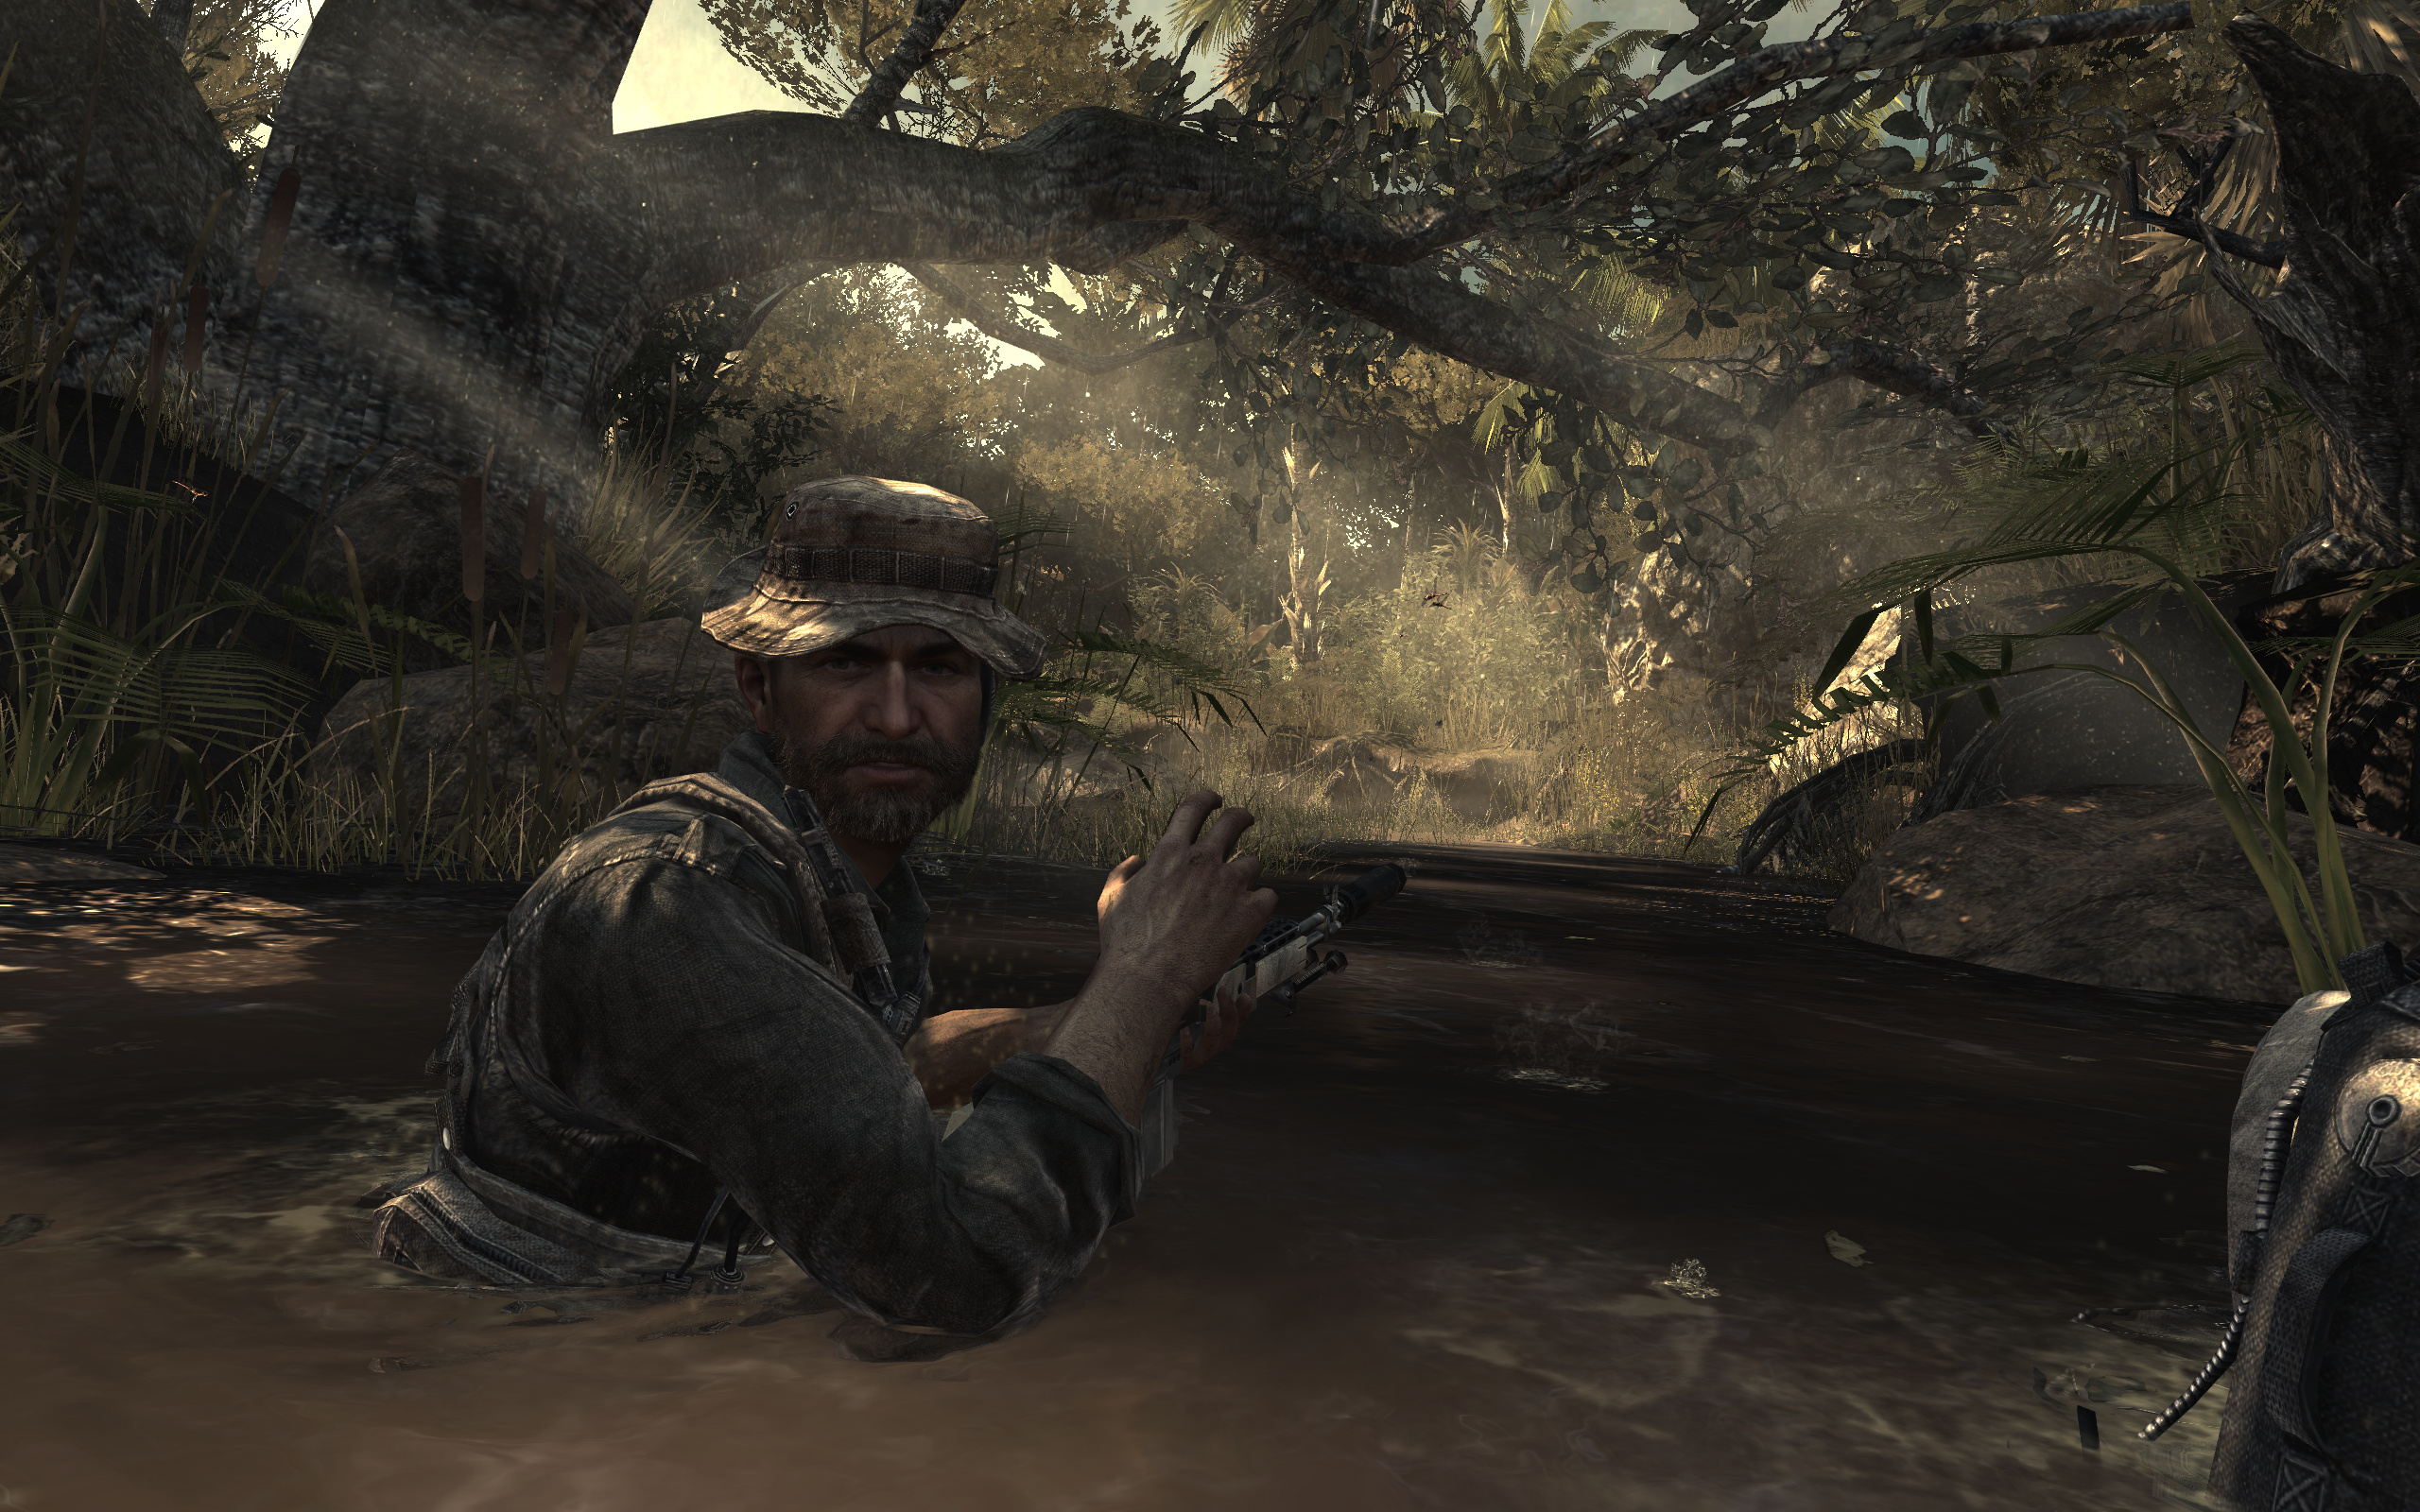 Modern Warfare 3 PC: Much better image quality without console upscaling